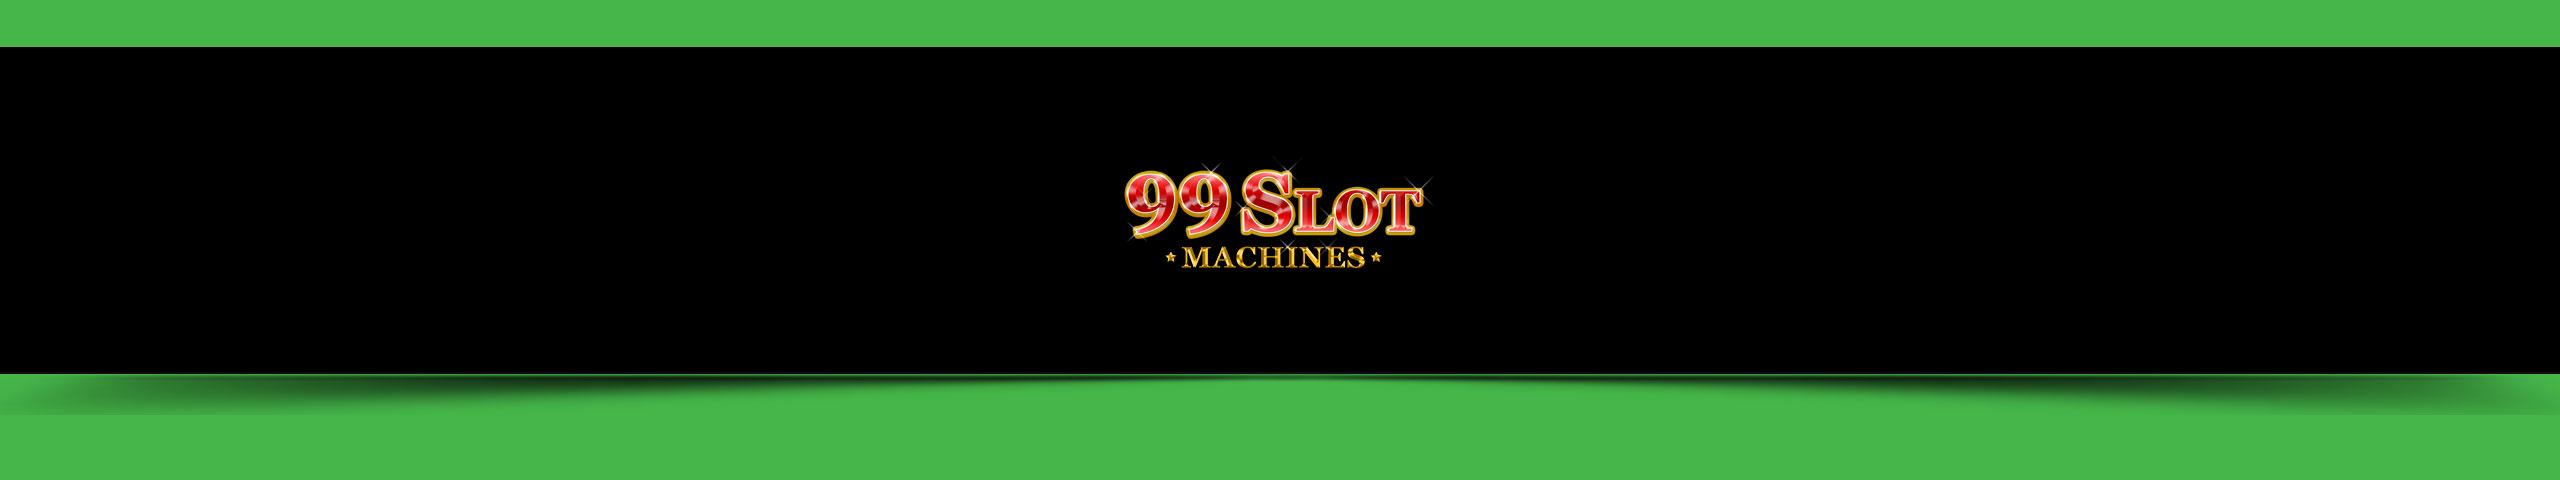 Vizualizarea Cazinoului 99 Slot Machines Casino - Multabafta.com Slider